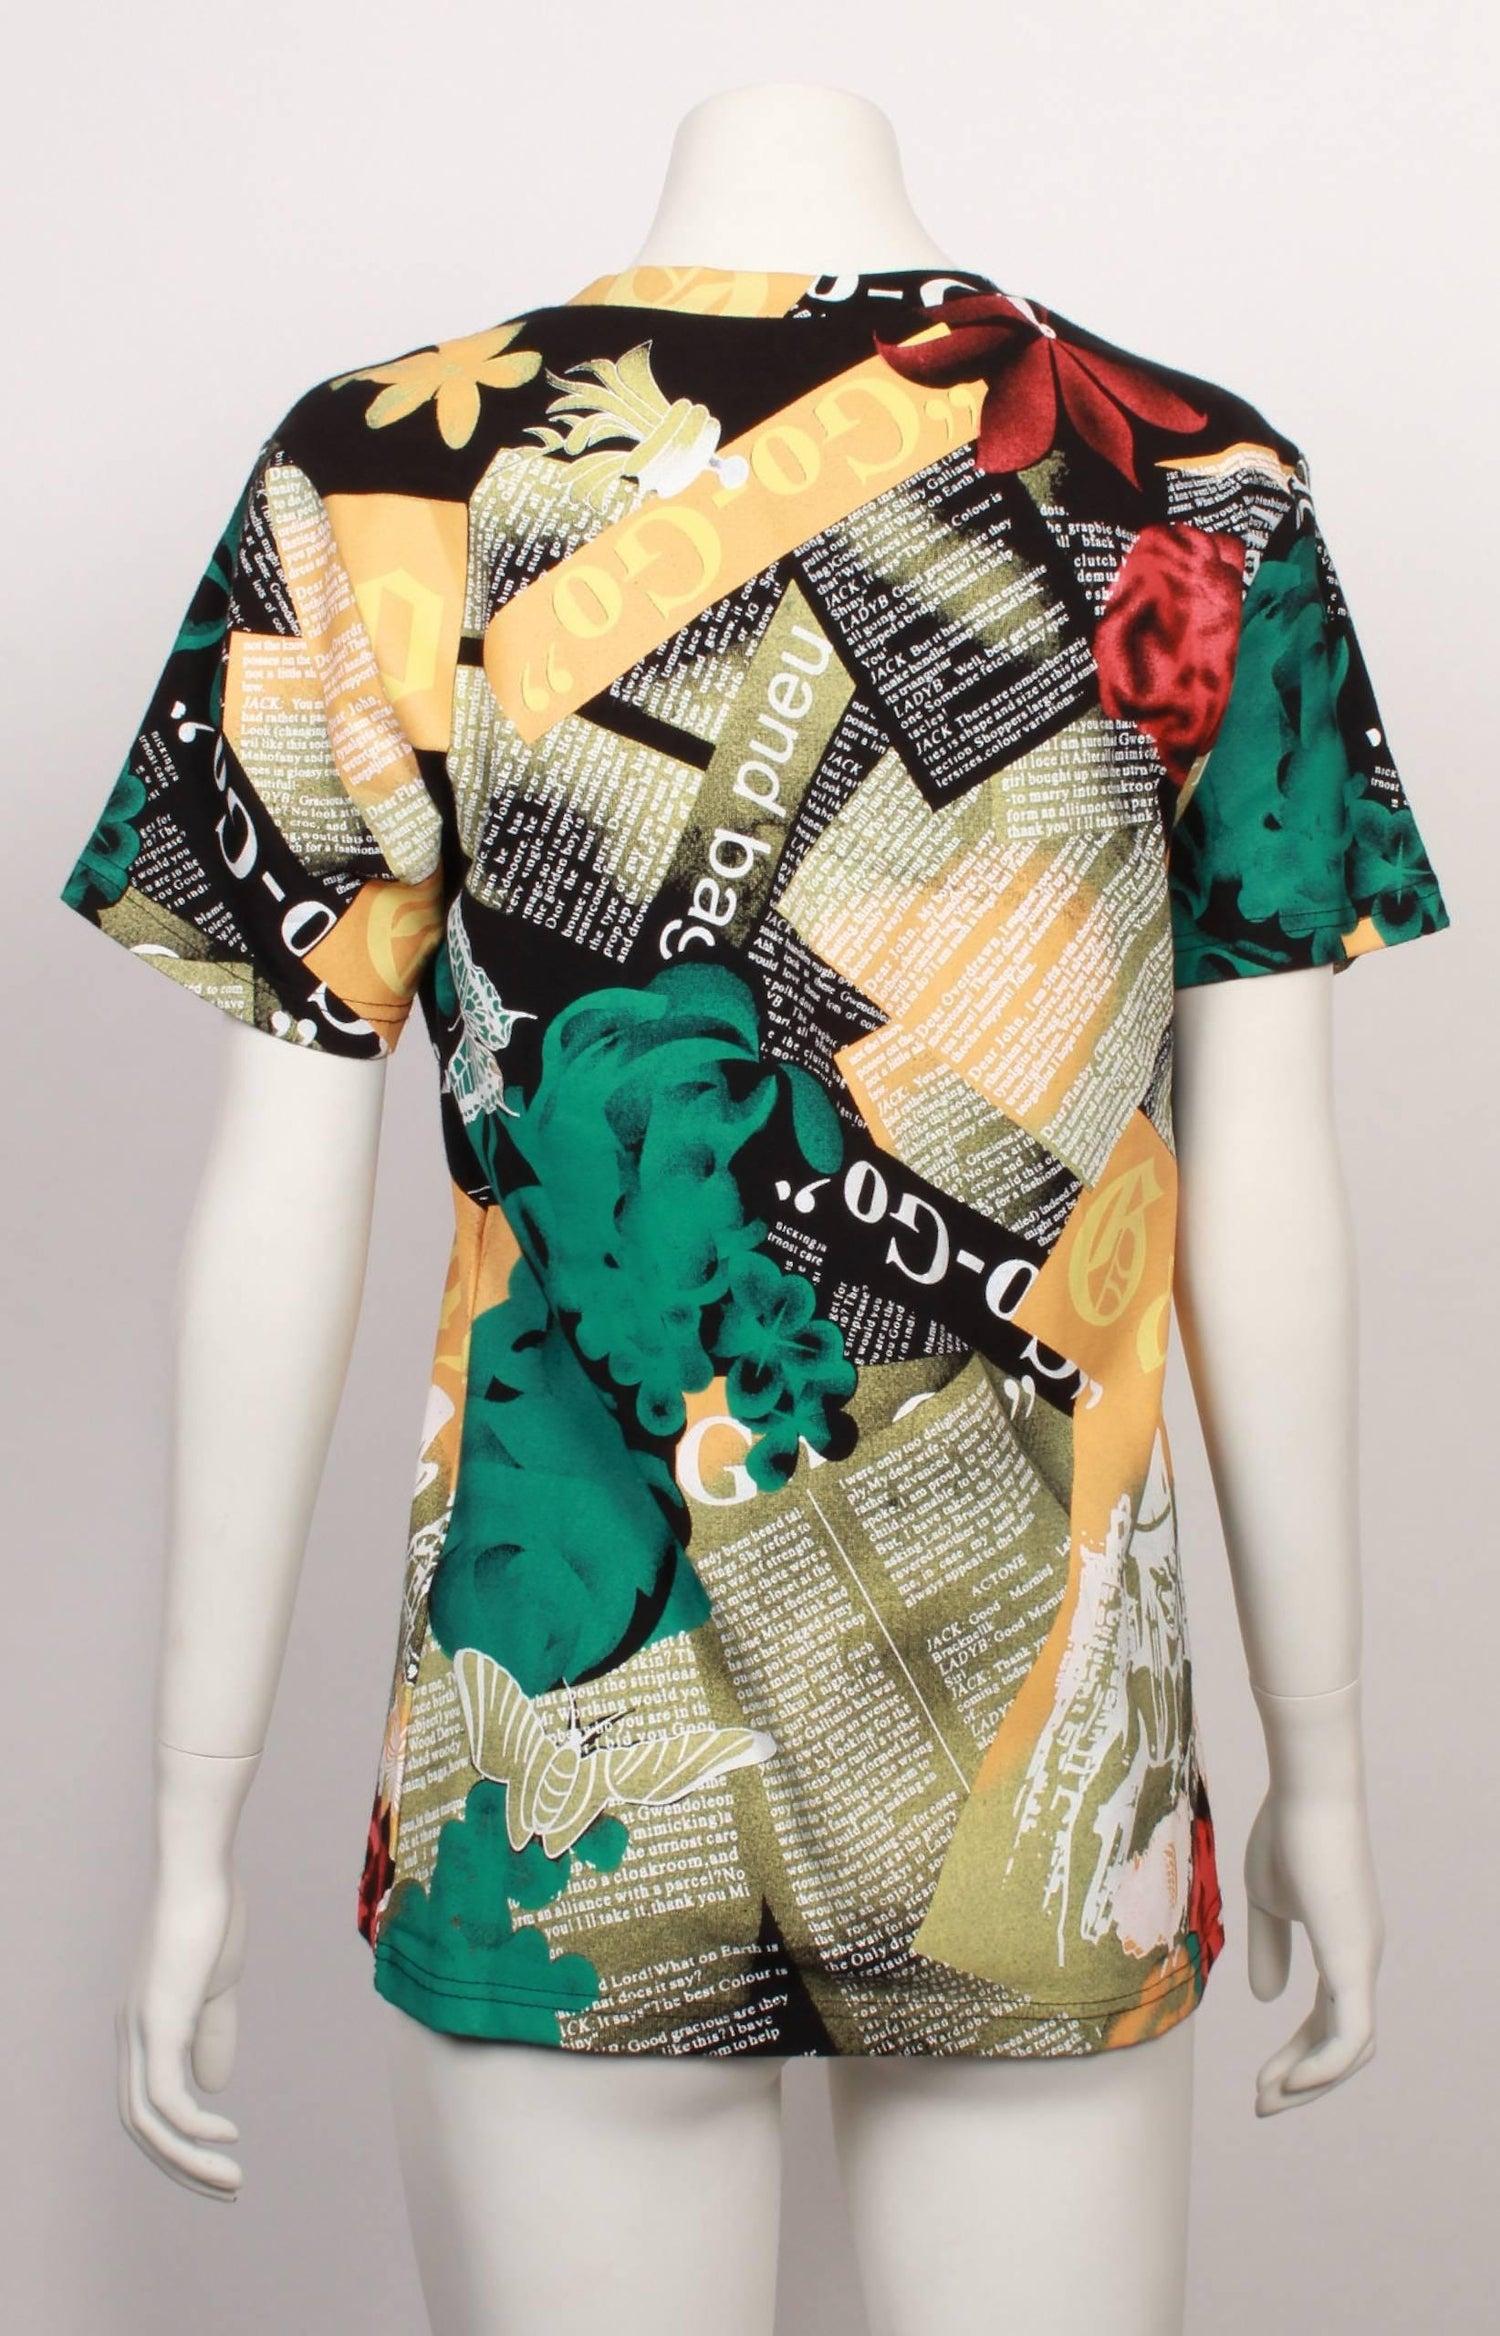 ffb75bf4 John Galliano Beachwear T-Shirt For Sale at 1stdibs